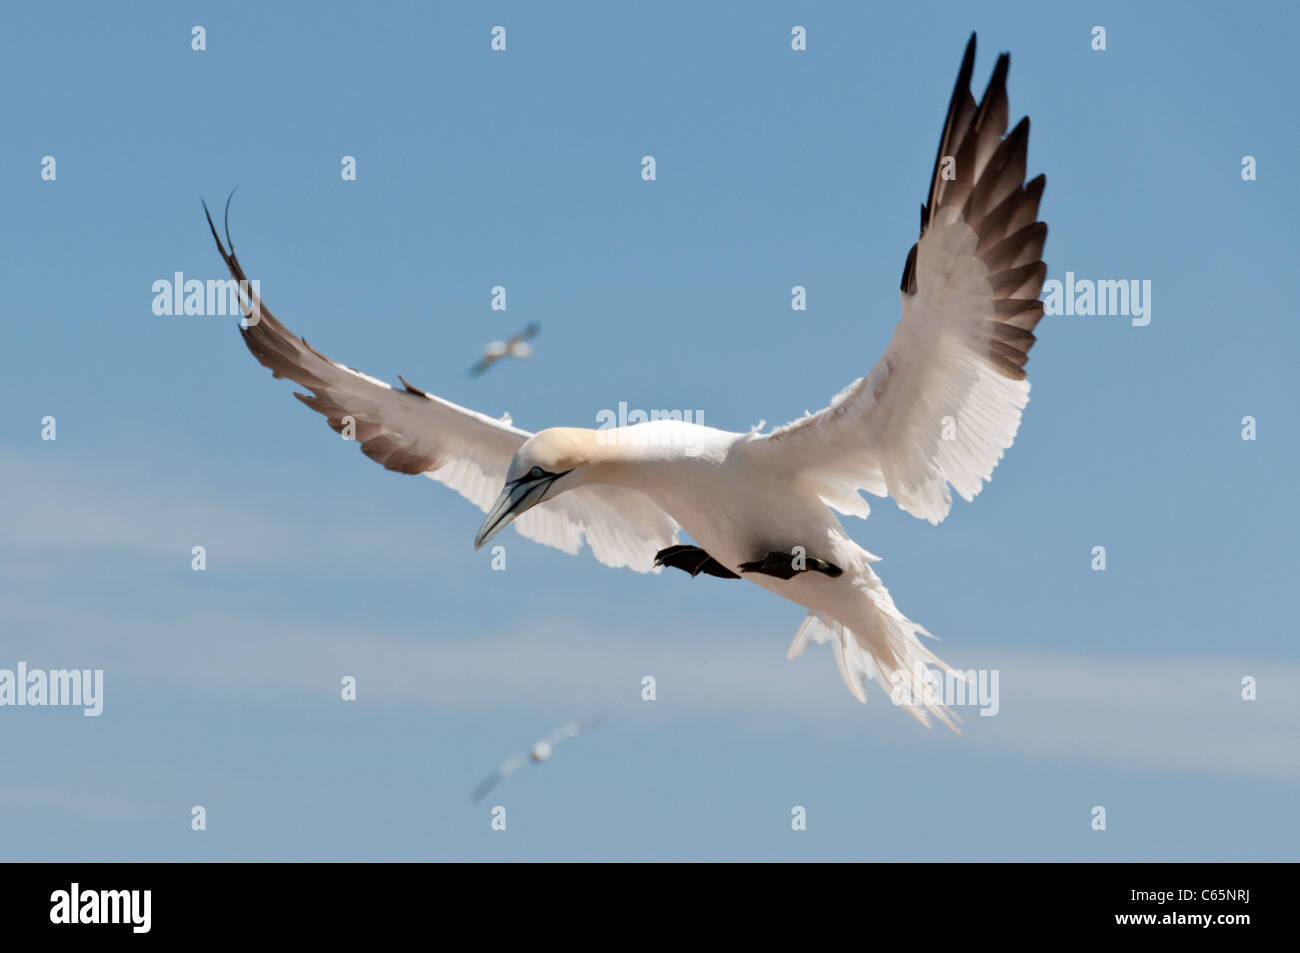 Flying northern gannet - Stock Image